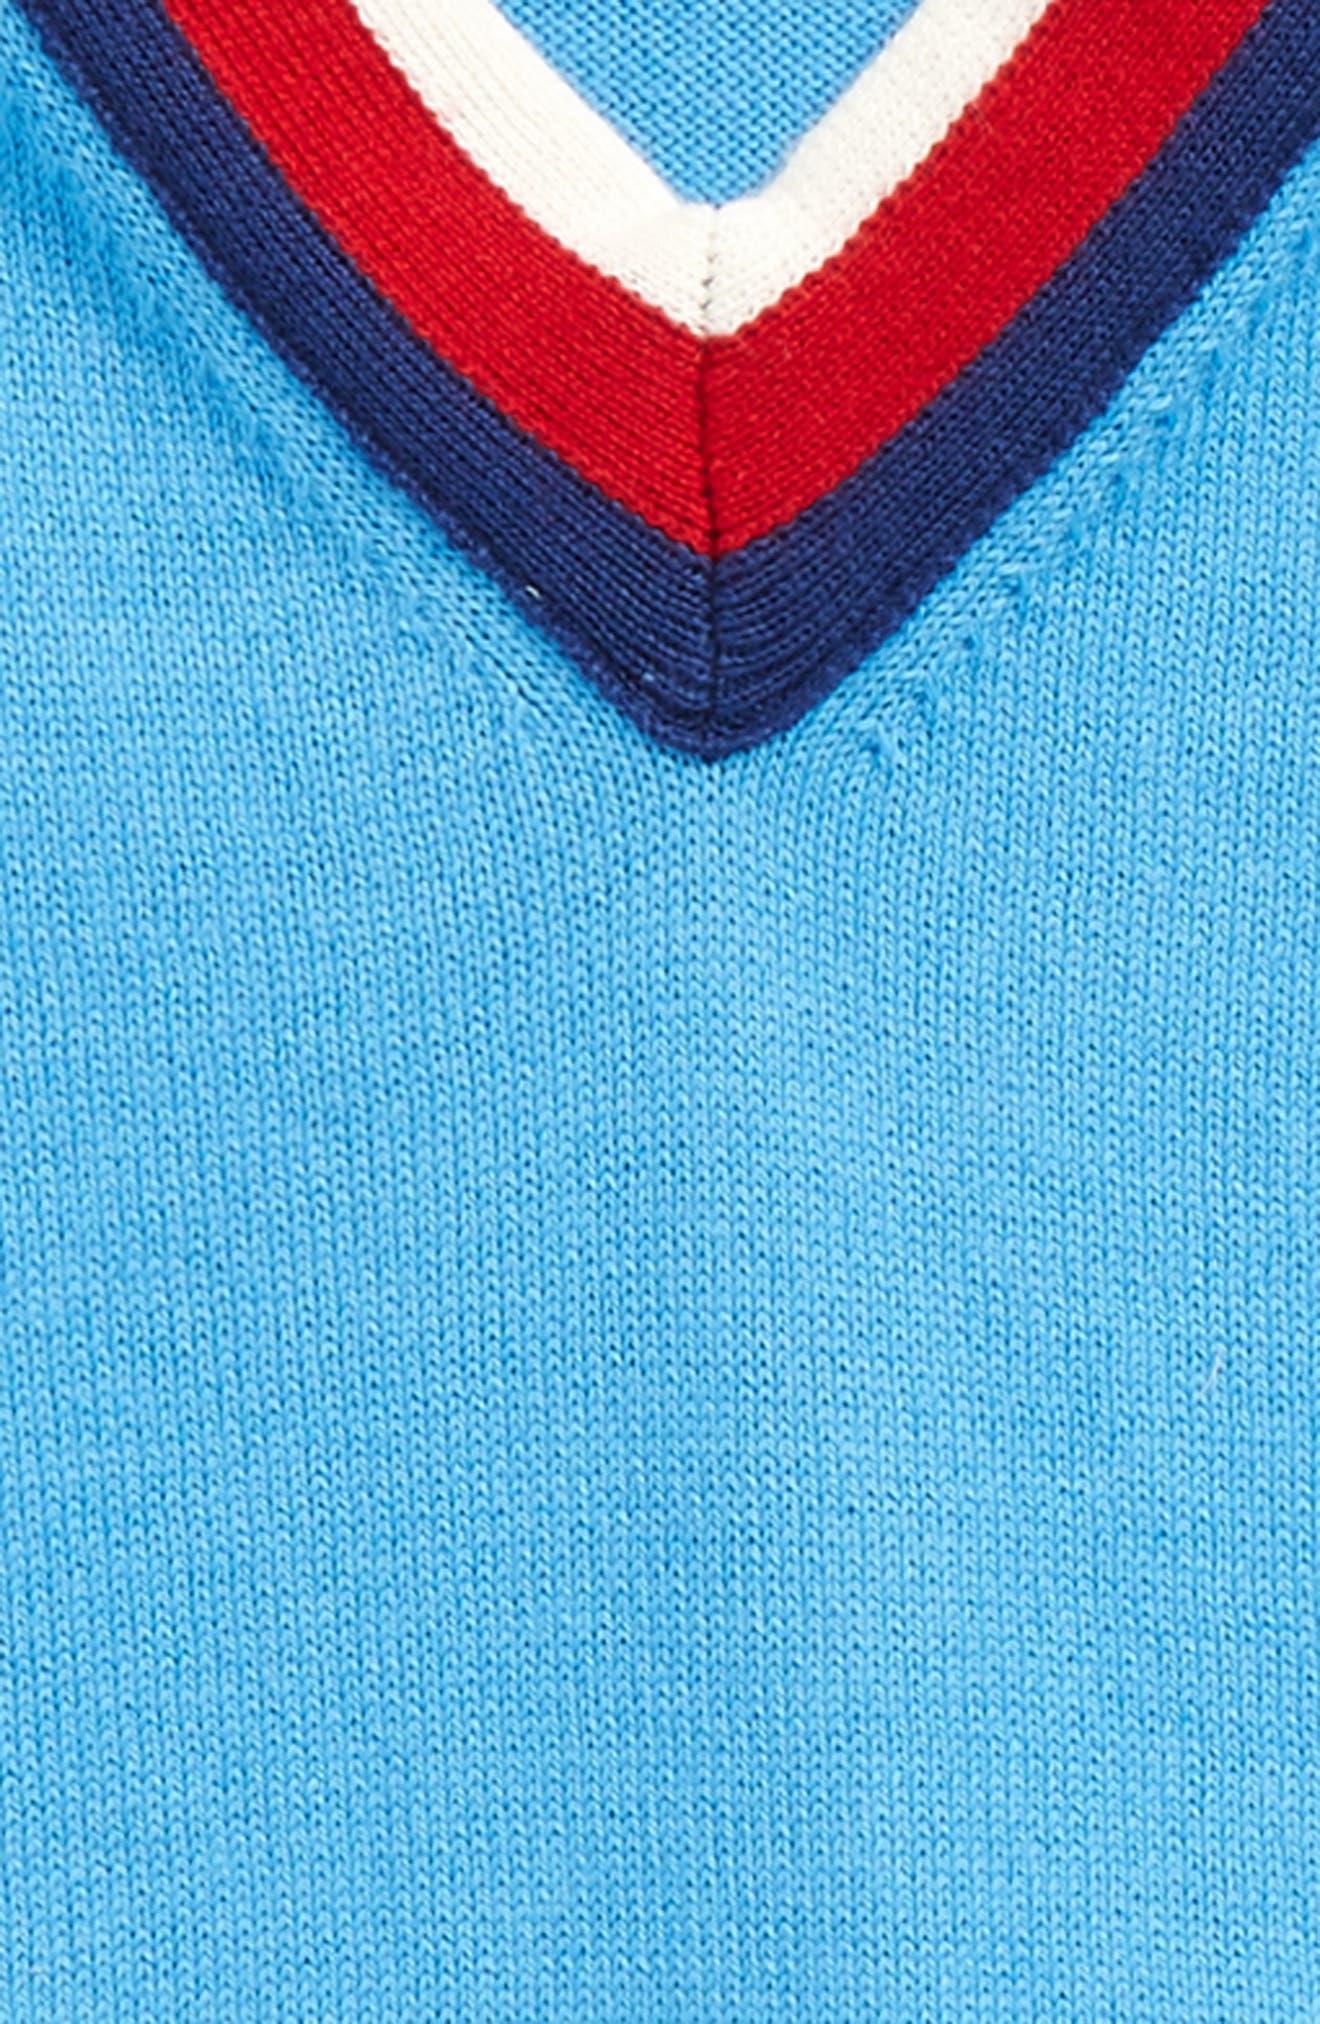 V-Neck Sweater,                             Alternate thumbnail 2, color,                             ROYAL/ IVORY